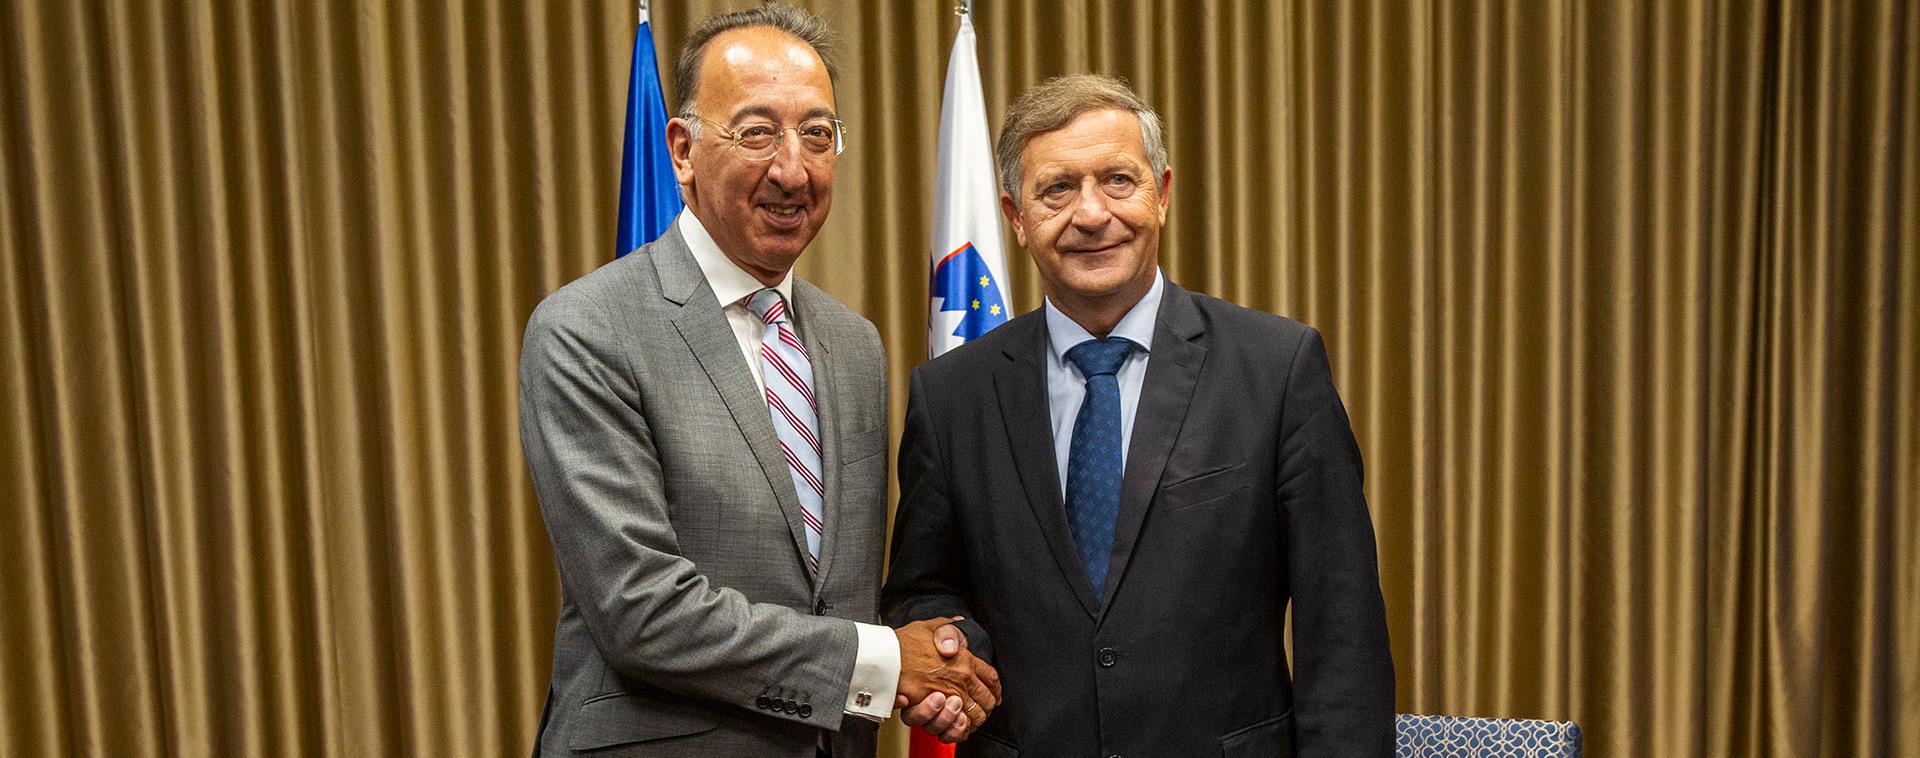 EDA Chief Executive in Slovenia for talks on EU defence cooperation